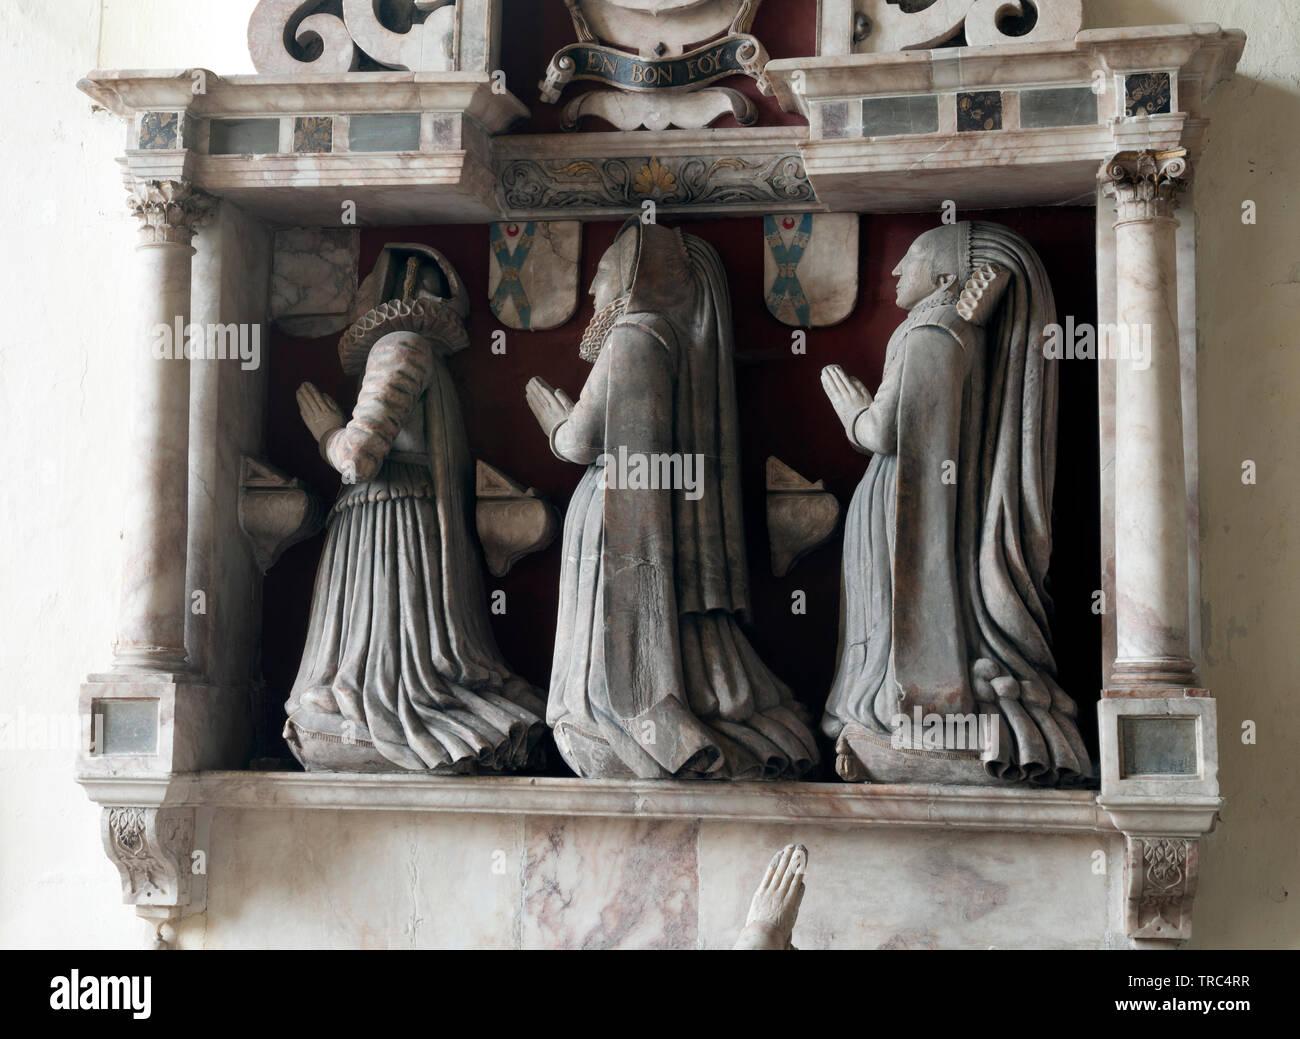 Henry Sacheverall monument, Holy Trinity Church, Ratcliffe-on-Soar, Nottinghamshire, England, UK - Stock Image